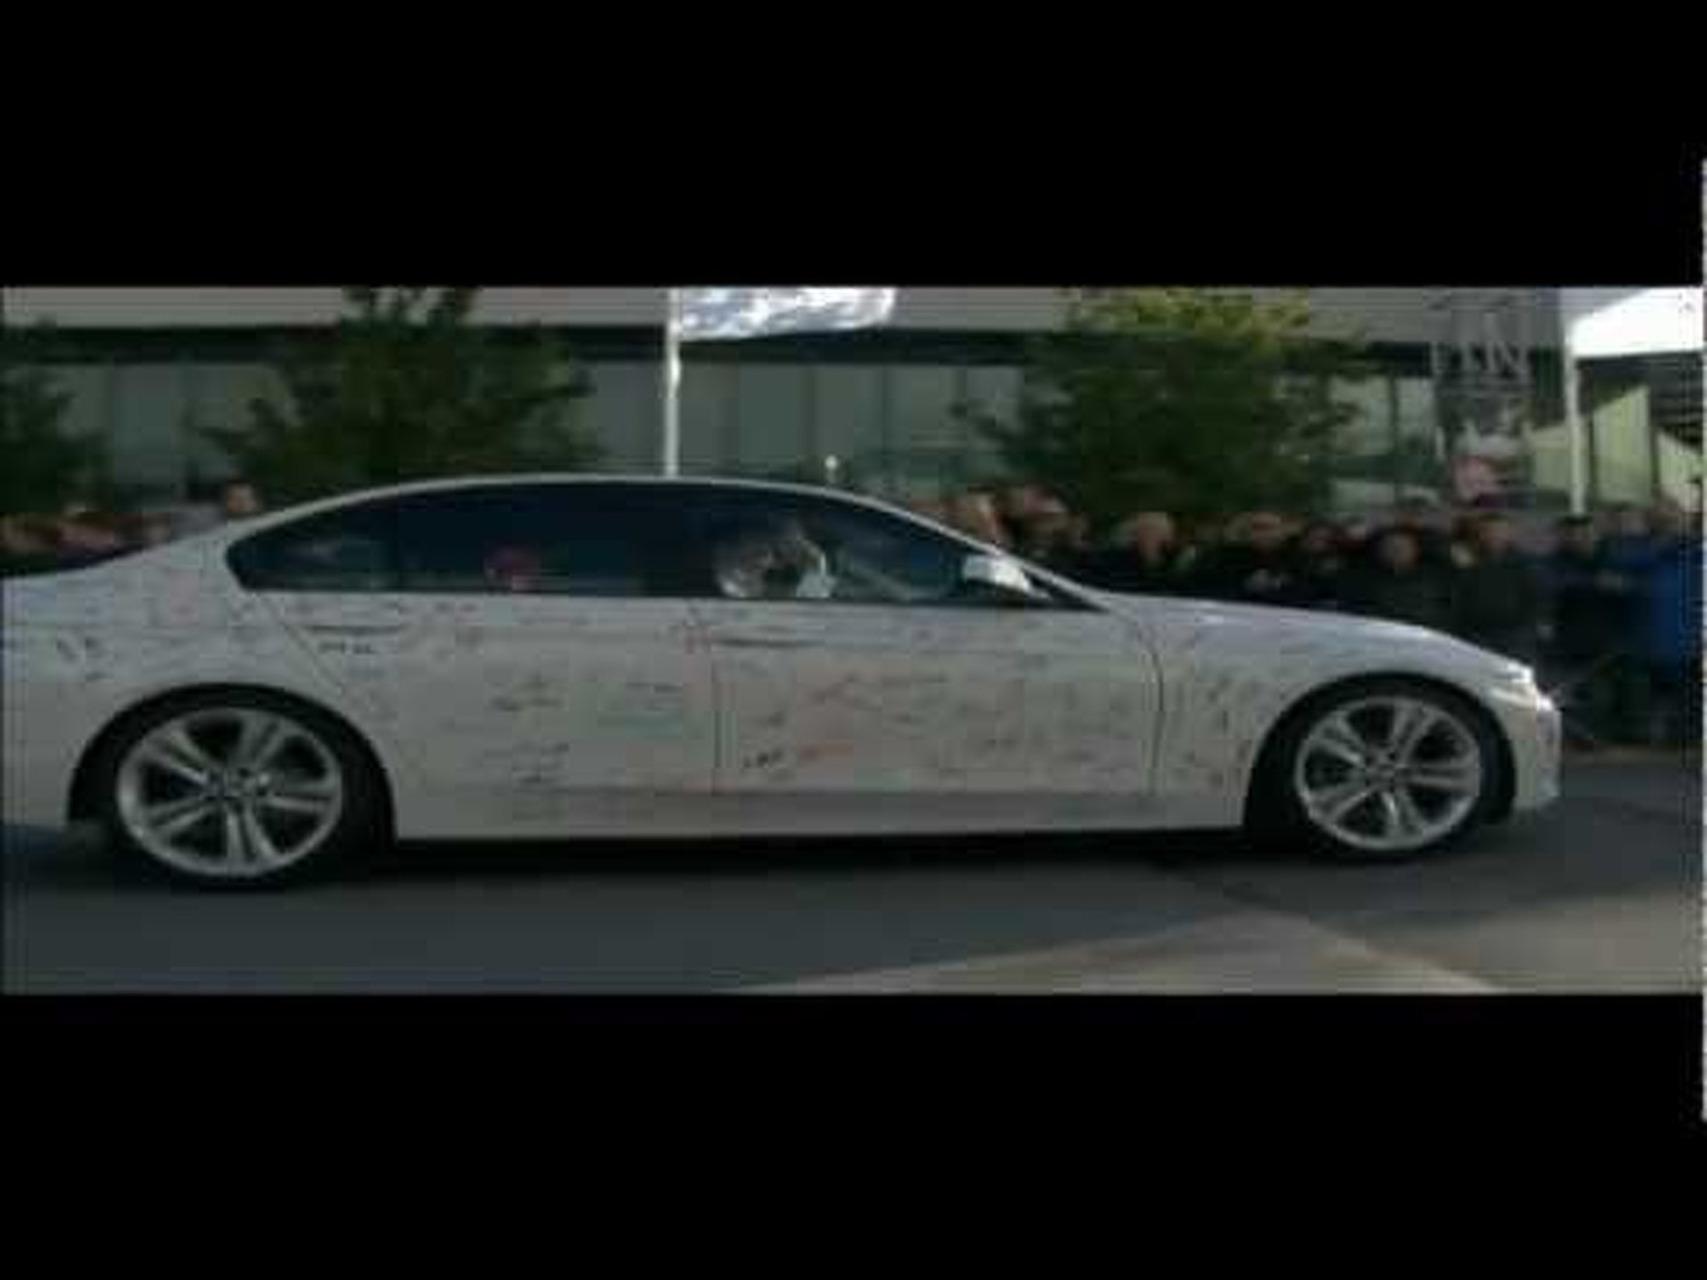 2012 BMW 3-Series World Premiere - First Impressions